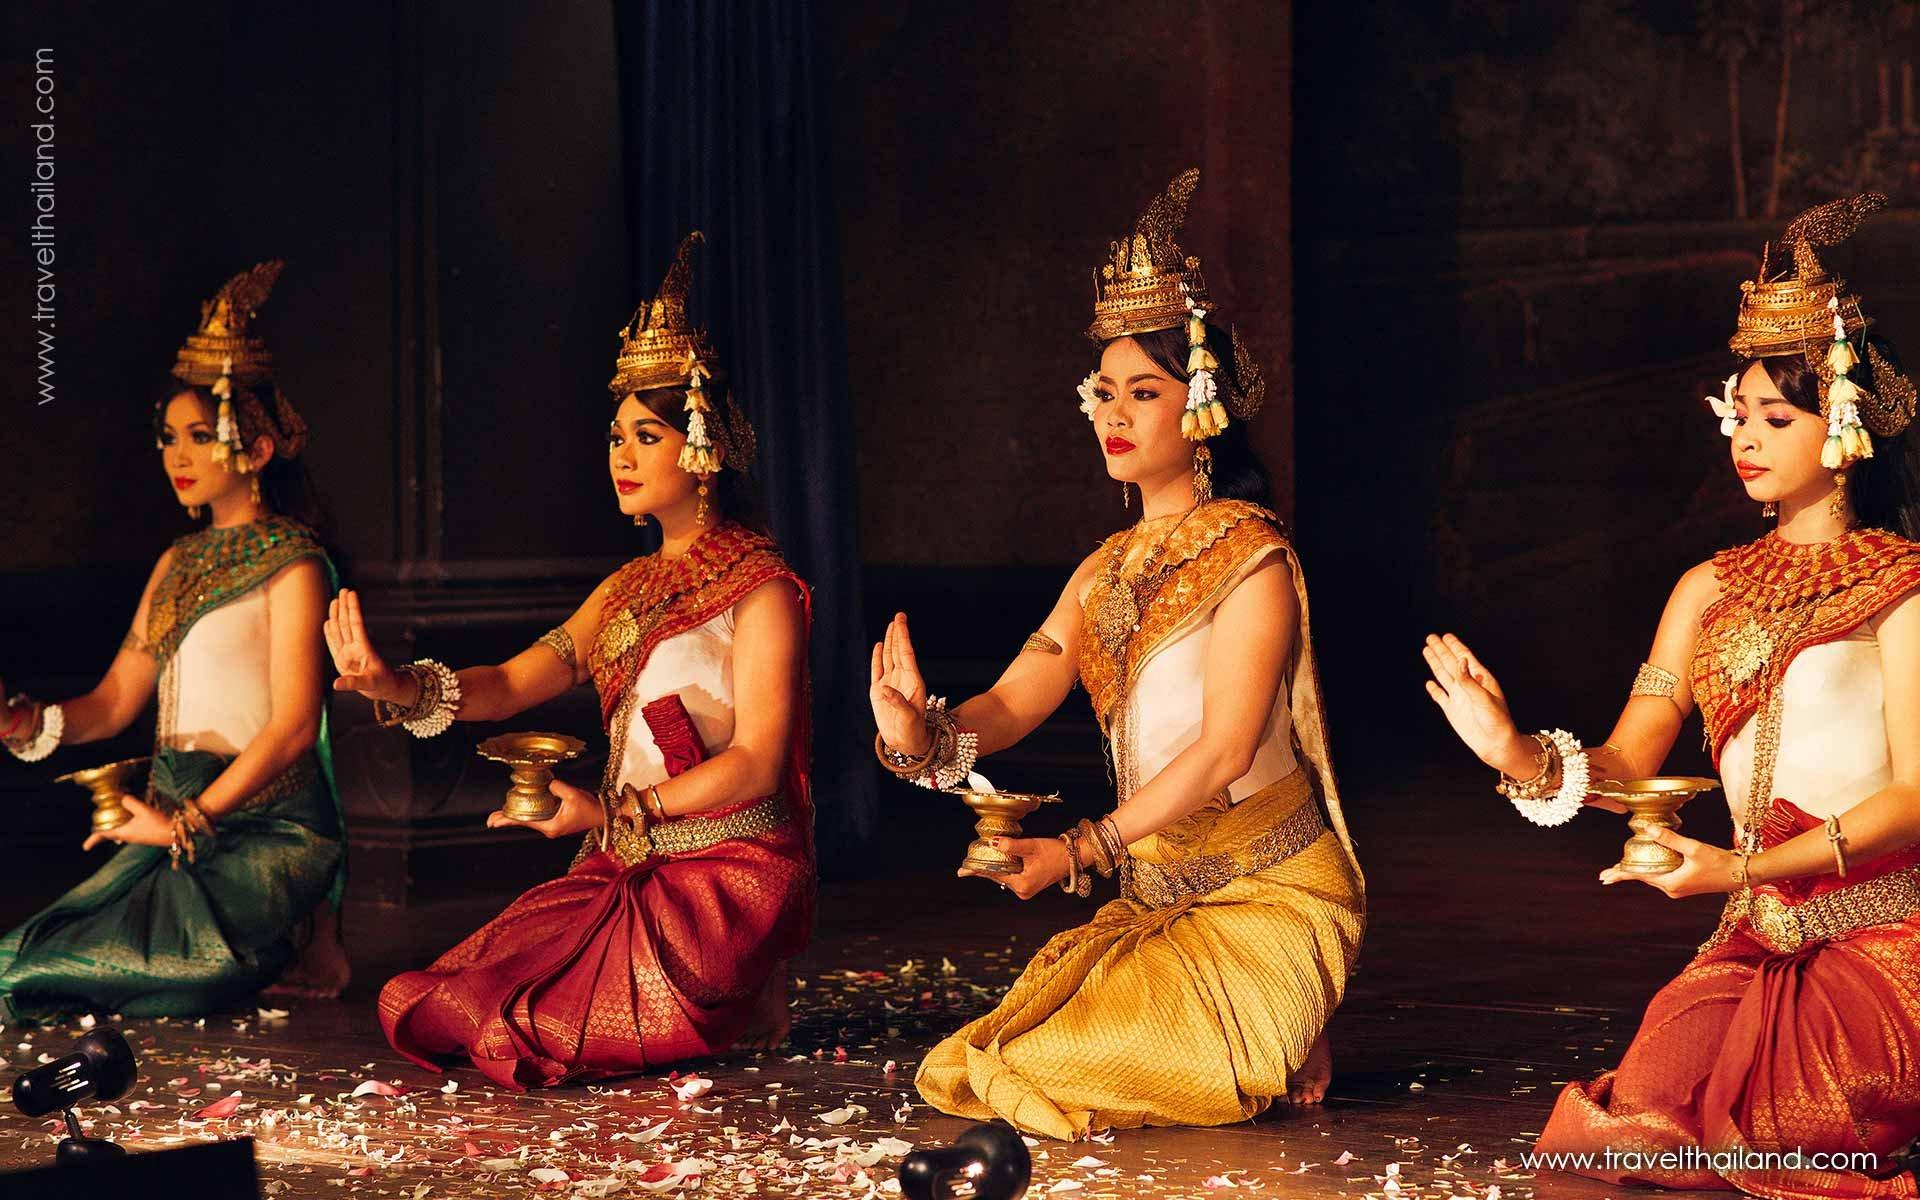 Luxury Thailand & Cambodia 10 days